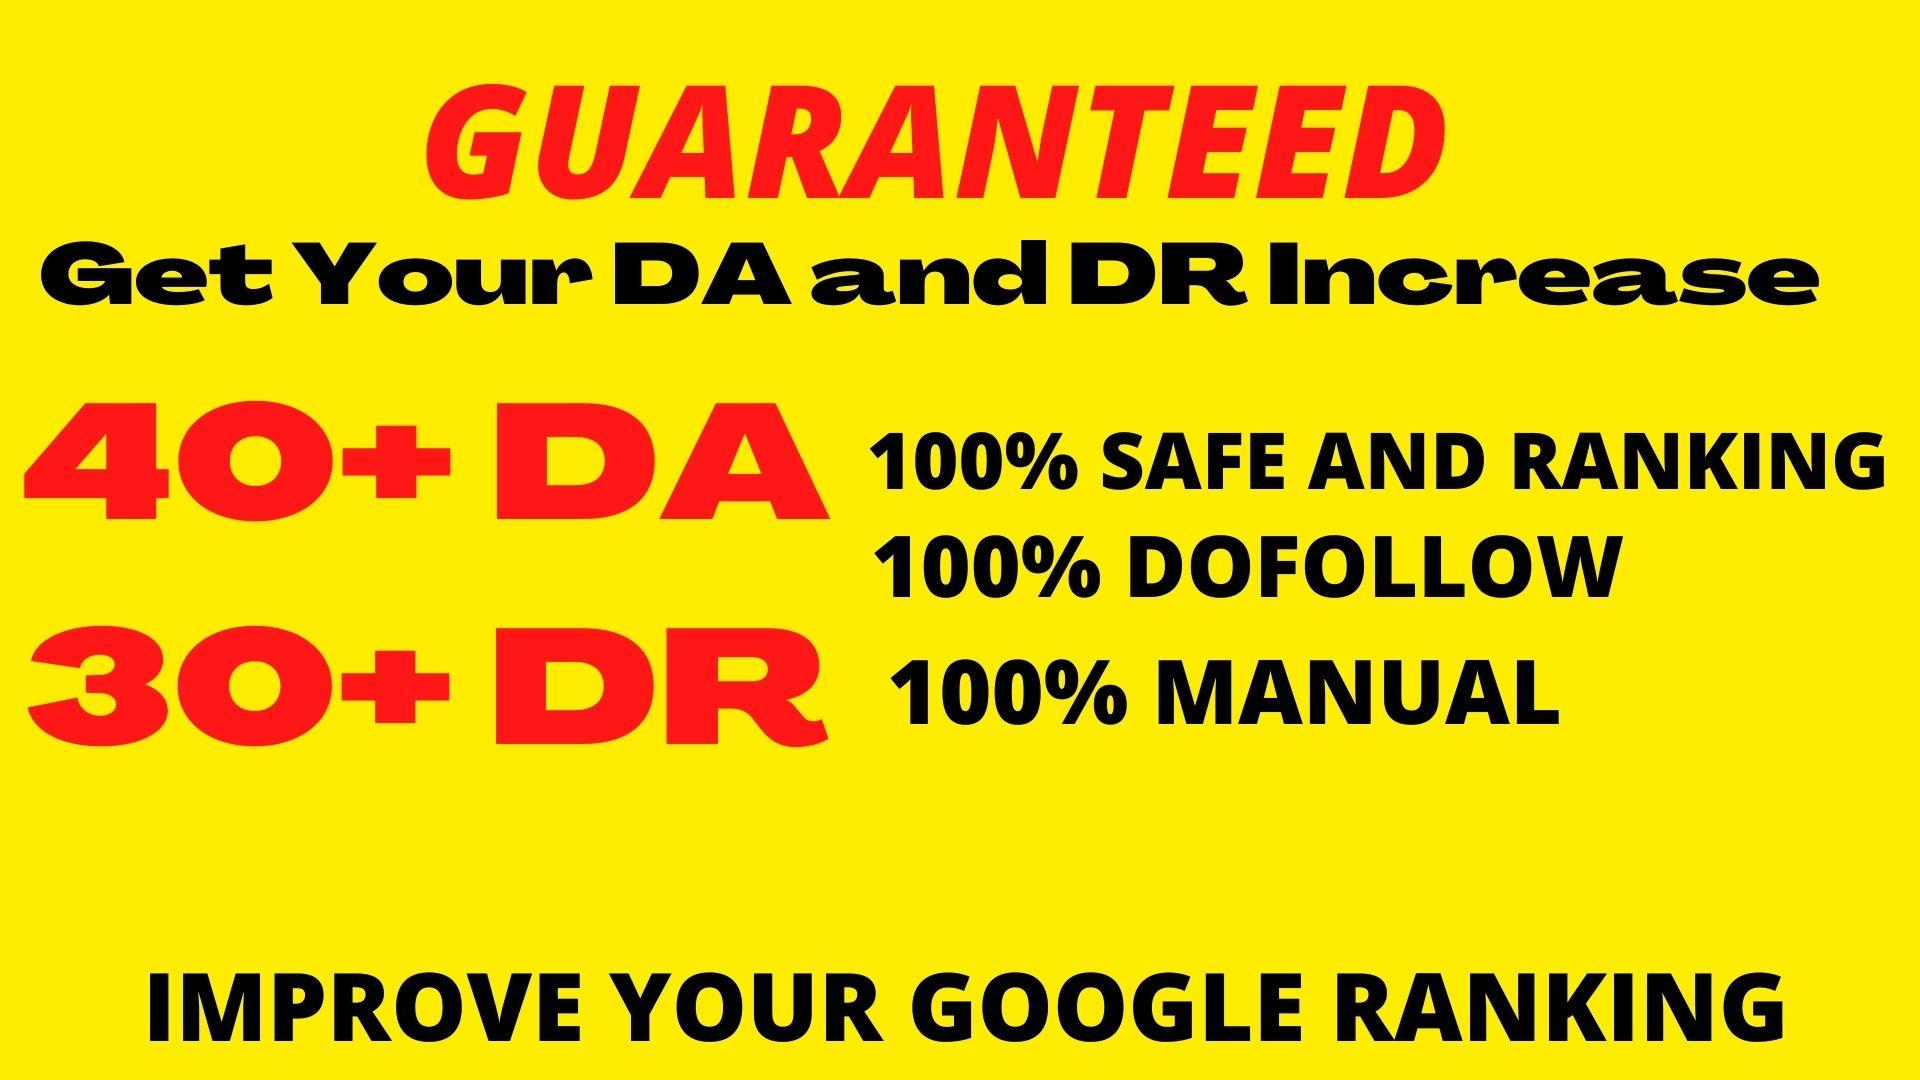 Manually Create 250+DOFOLLOW High PR 1-PR 7+ or DA-40+Highly Authorized Google Dominating Backlinks